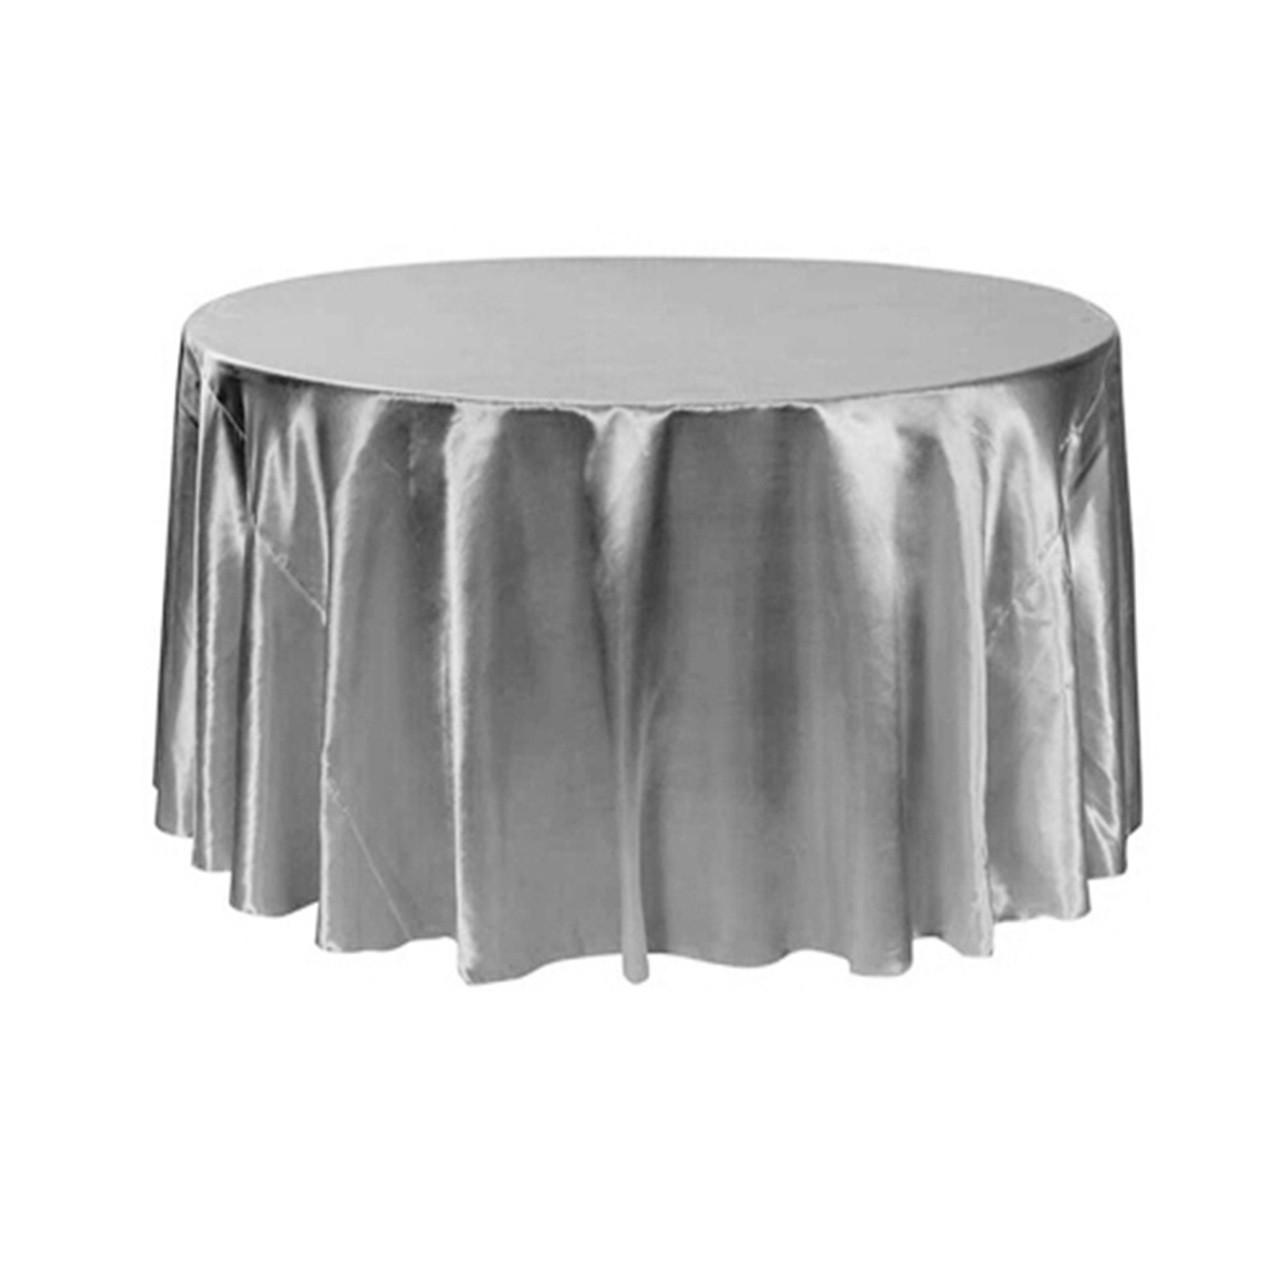 a7ce0418002de 120 Inch Round Satin Tablecloth Dark Silver / Platinum - Your Chair ...